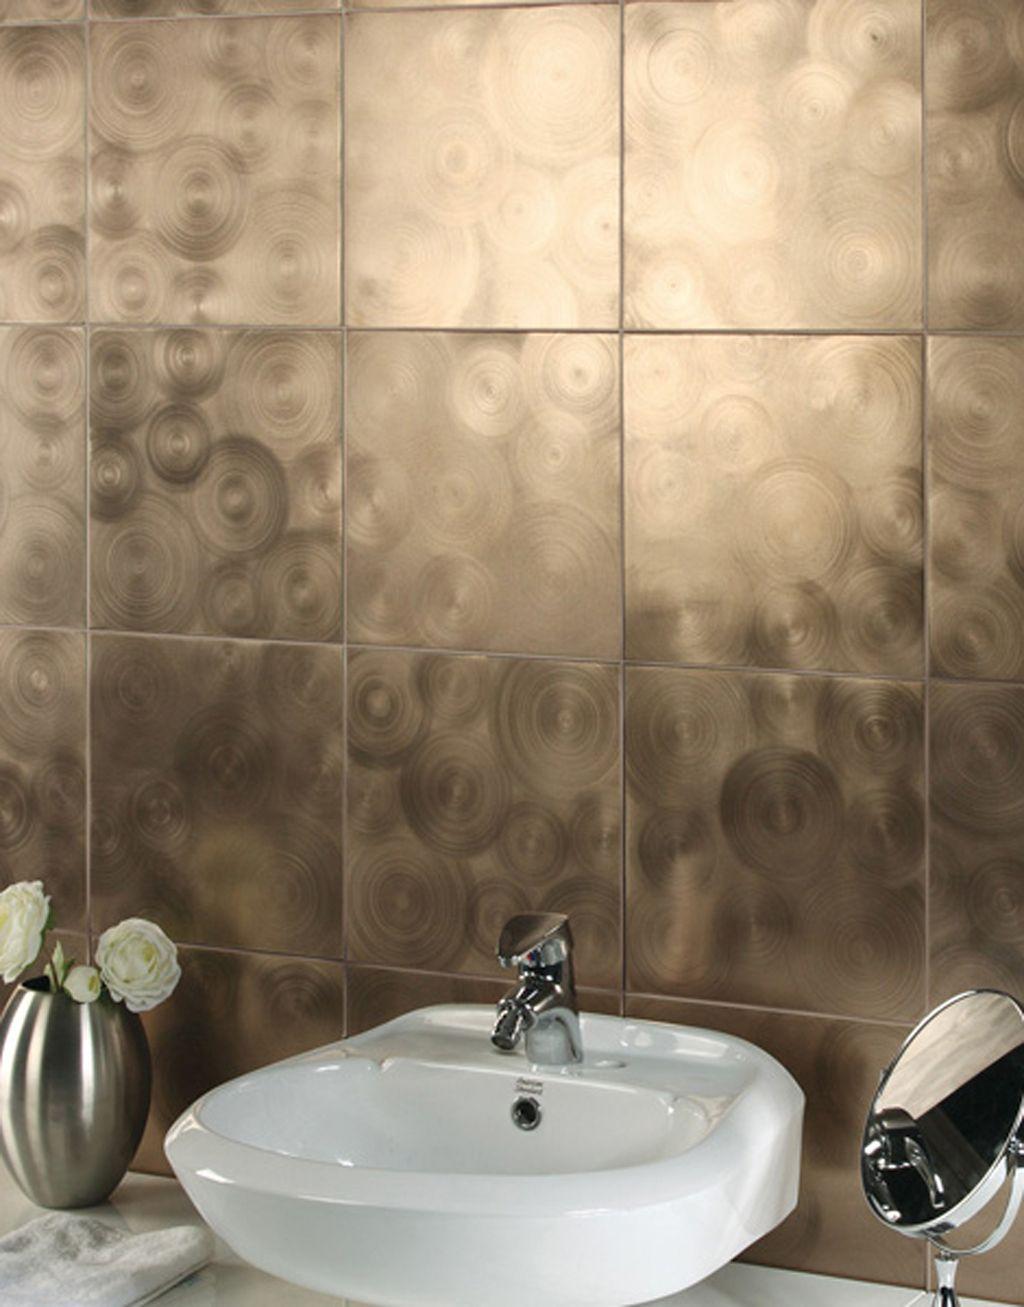 Shiny Wall Tile Decor Ideas Bathroom Tile Designs Modern Bathroom Decor Small Tile Shower